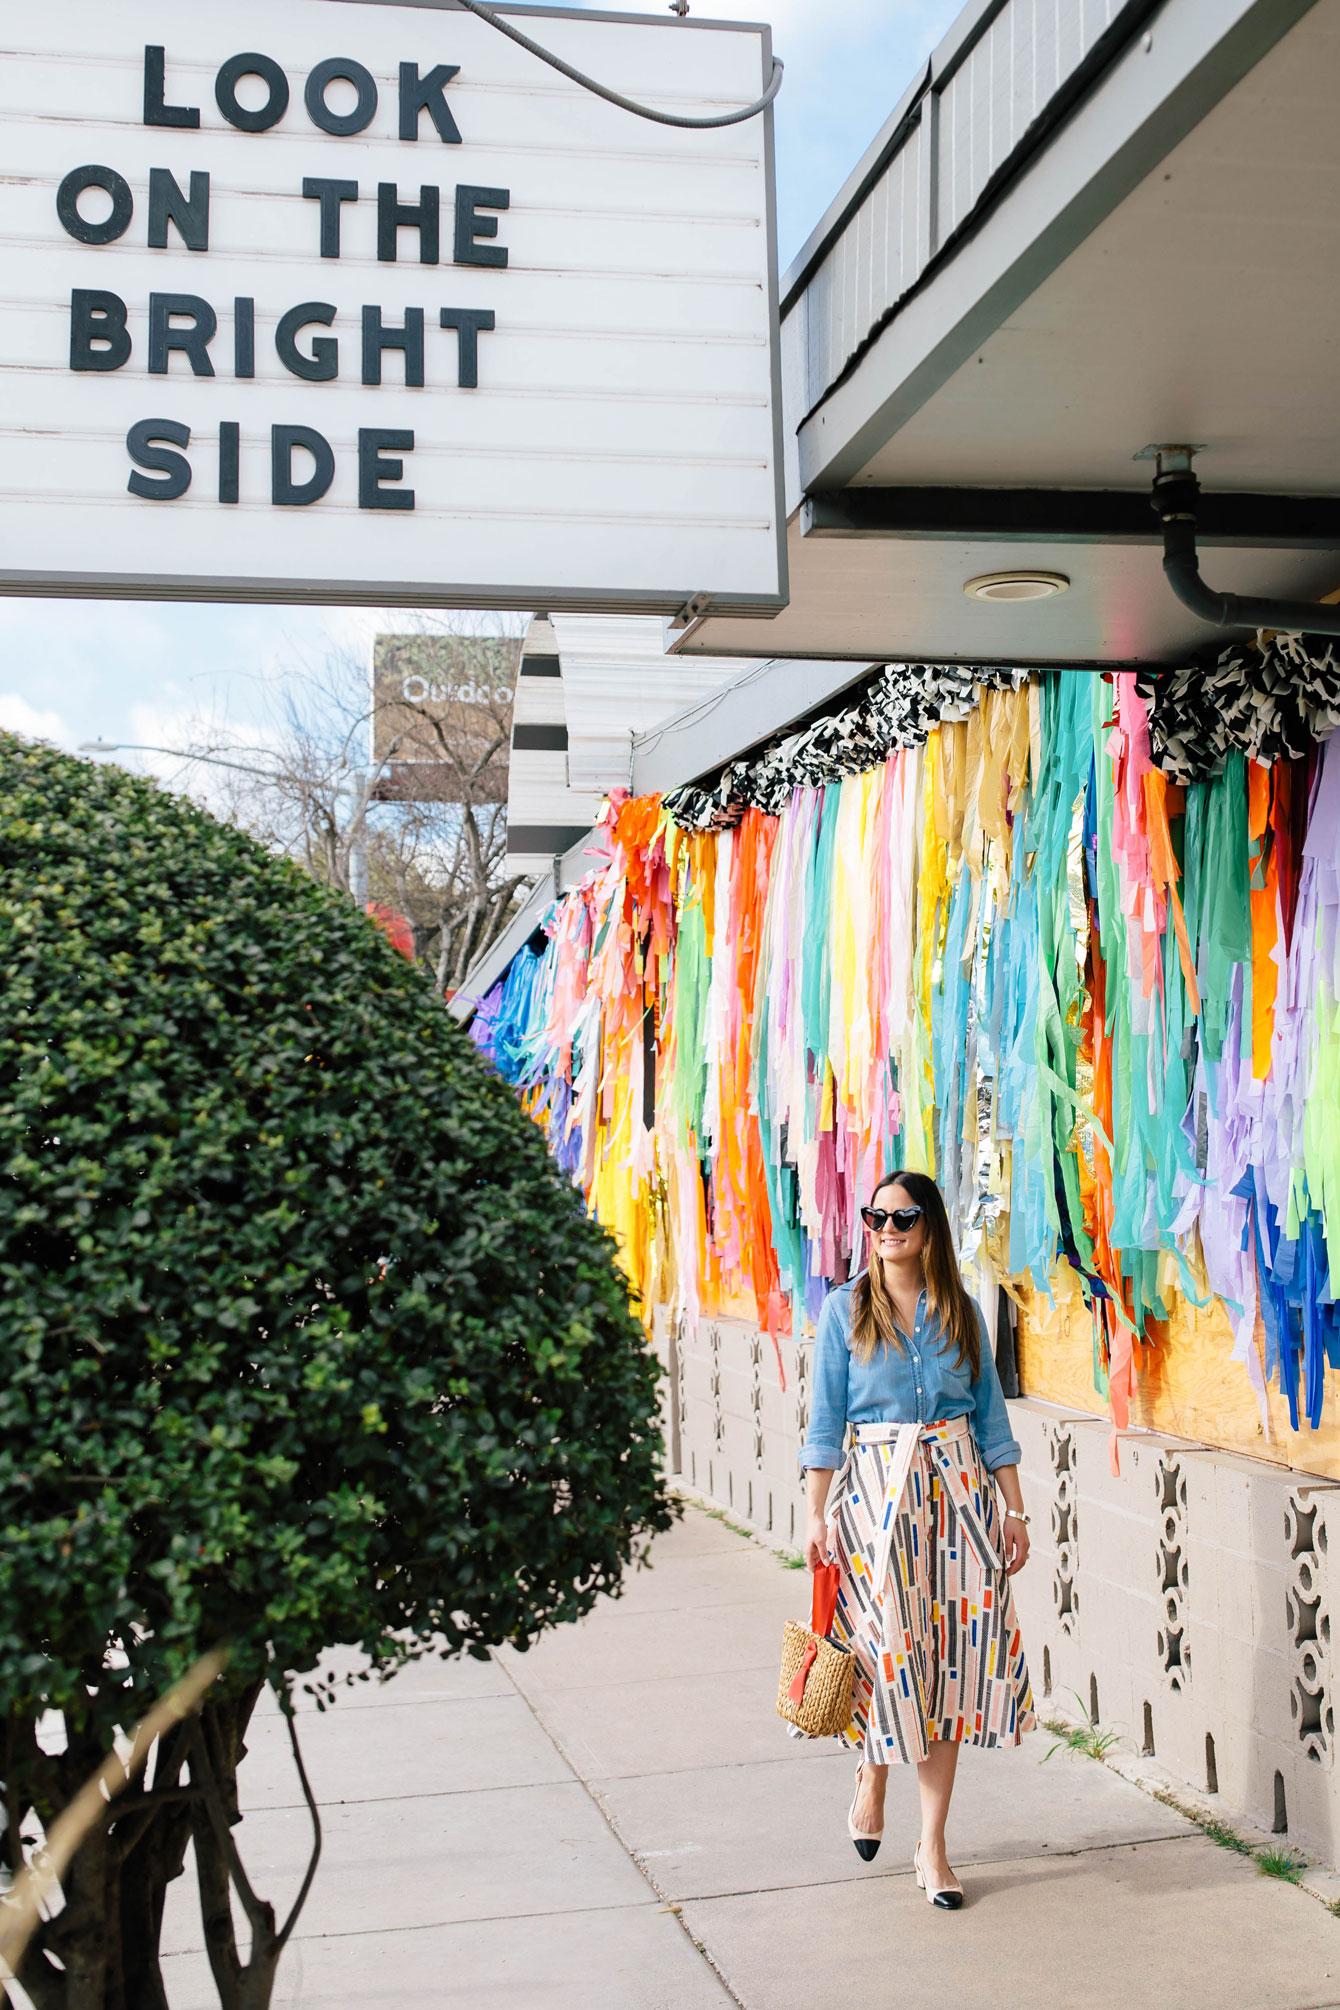 Austin South Congress SXSW 2018